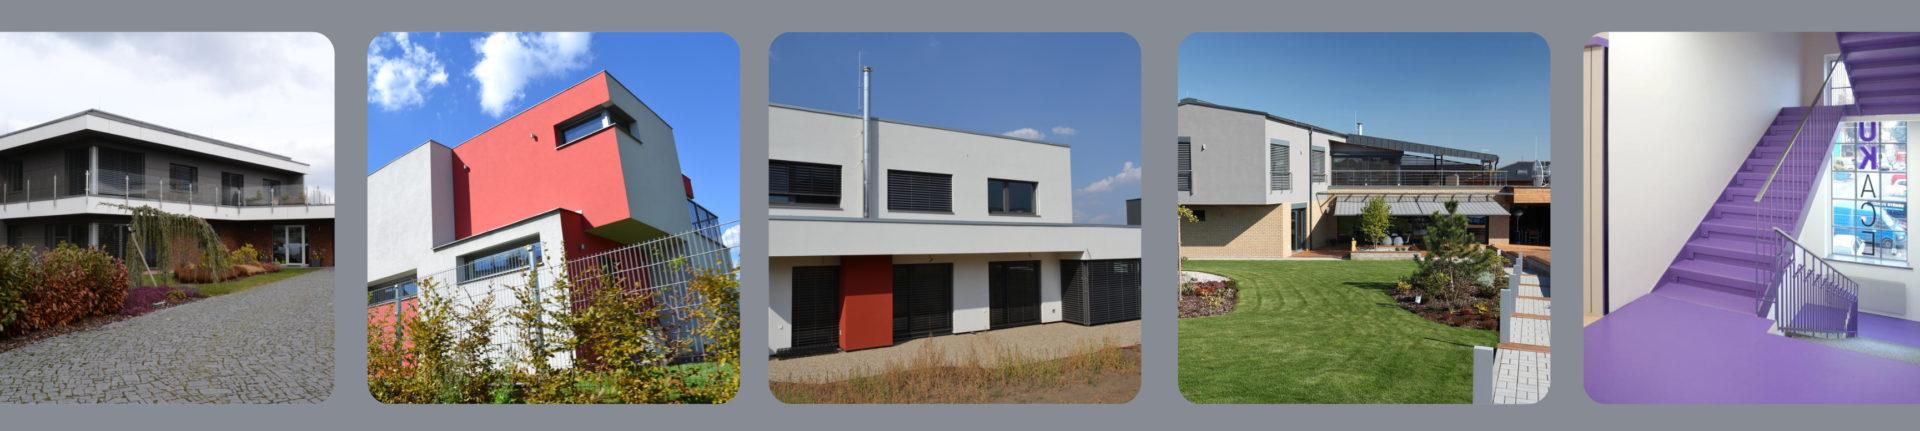 Architekt studio